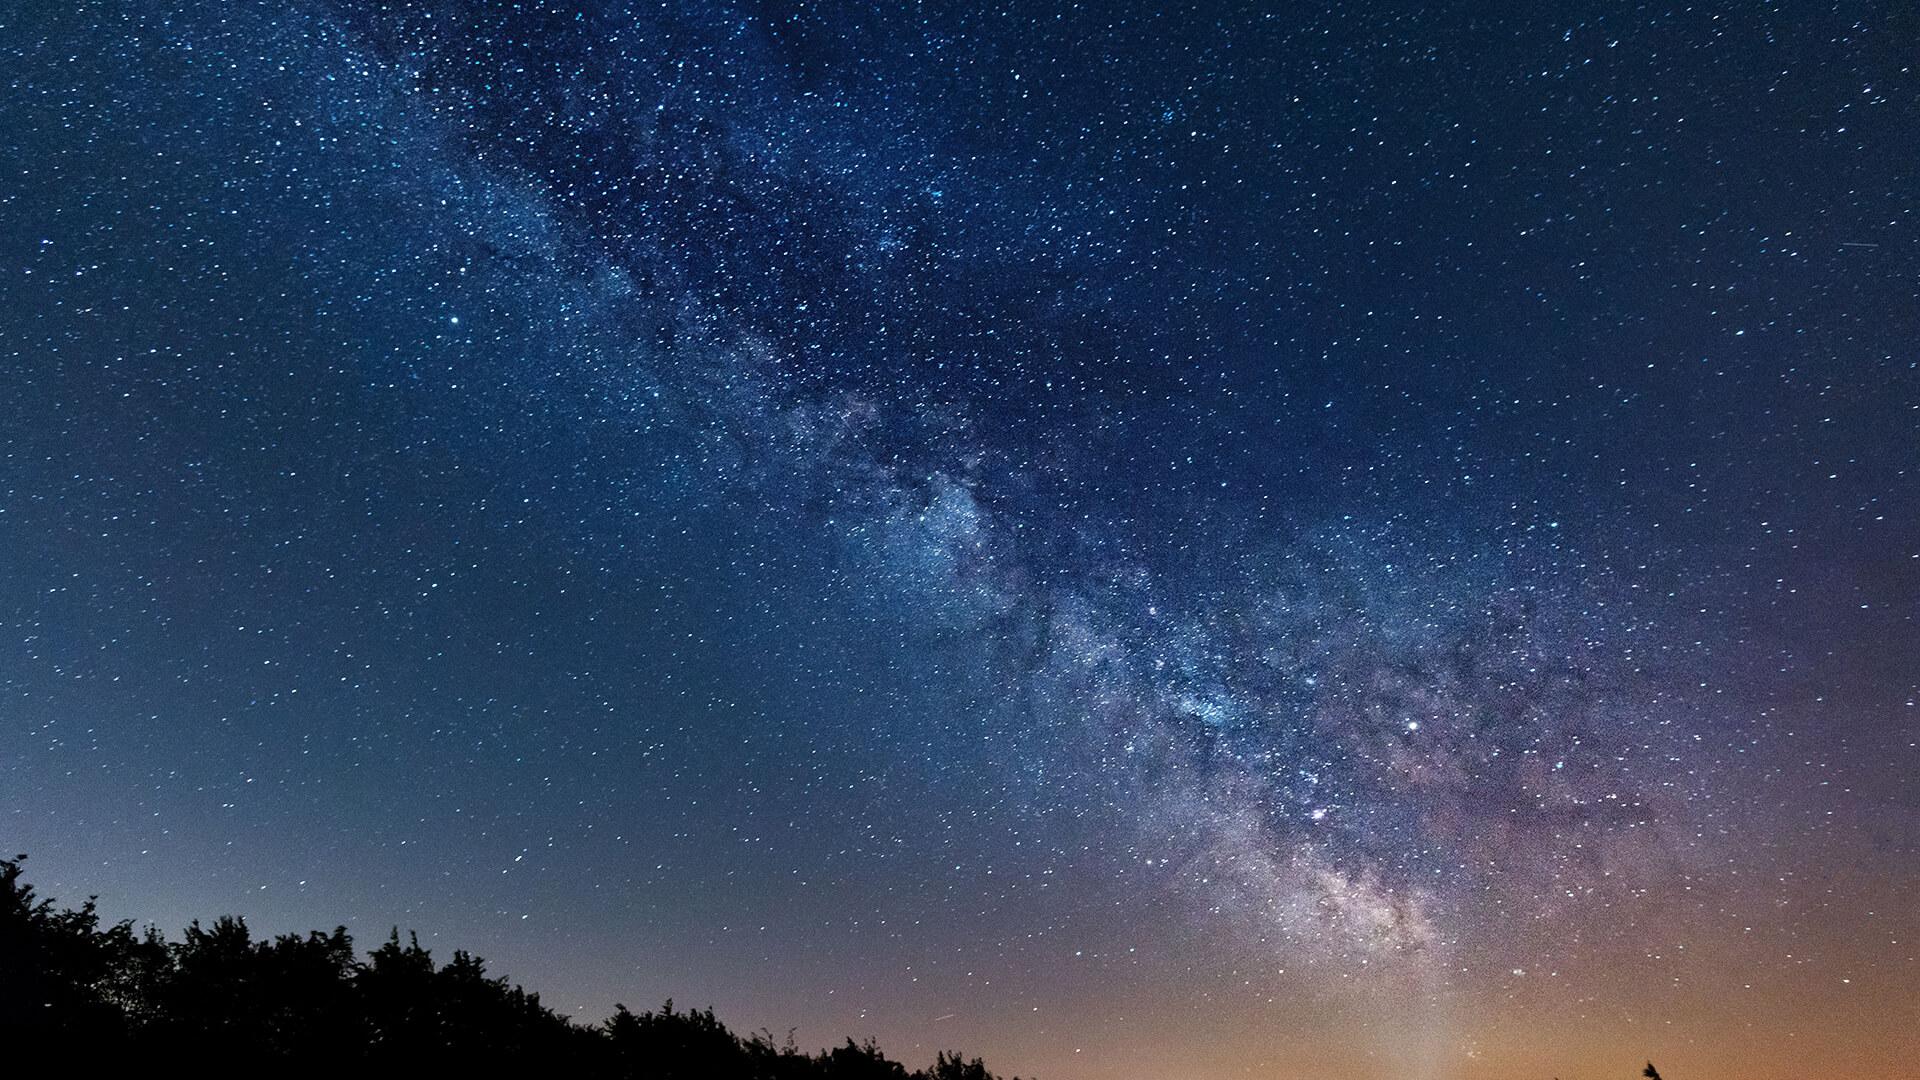 Starry sky over the International Star Park Eifel National Park